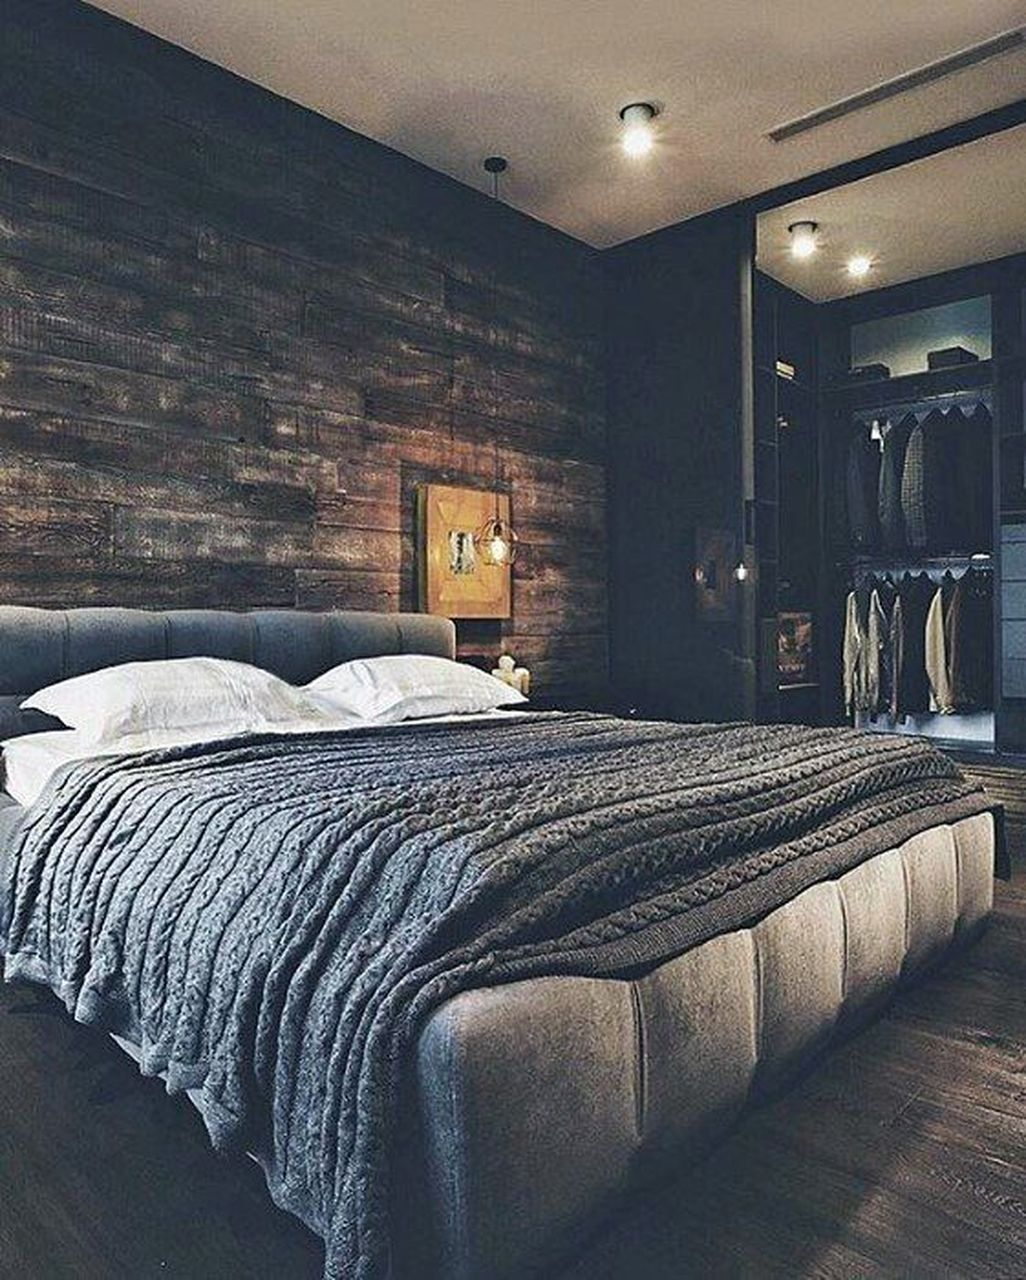 Nice 40 Masculine And Modern Man Bedroom Design Ideas More At Https Homystyle Com 2018 07 29 4 Men S Bedroom Design Modern Mens Bedroom Bachelor Pad Bedroom Bedroom ideas for mens